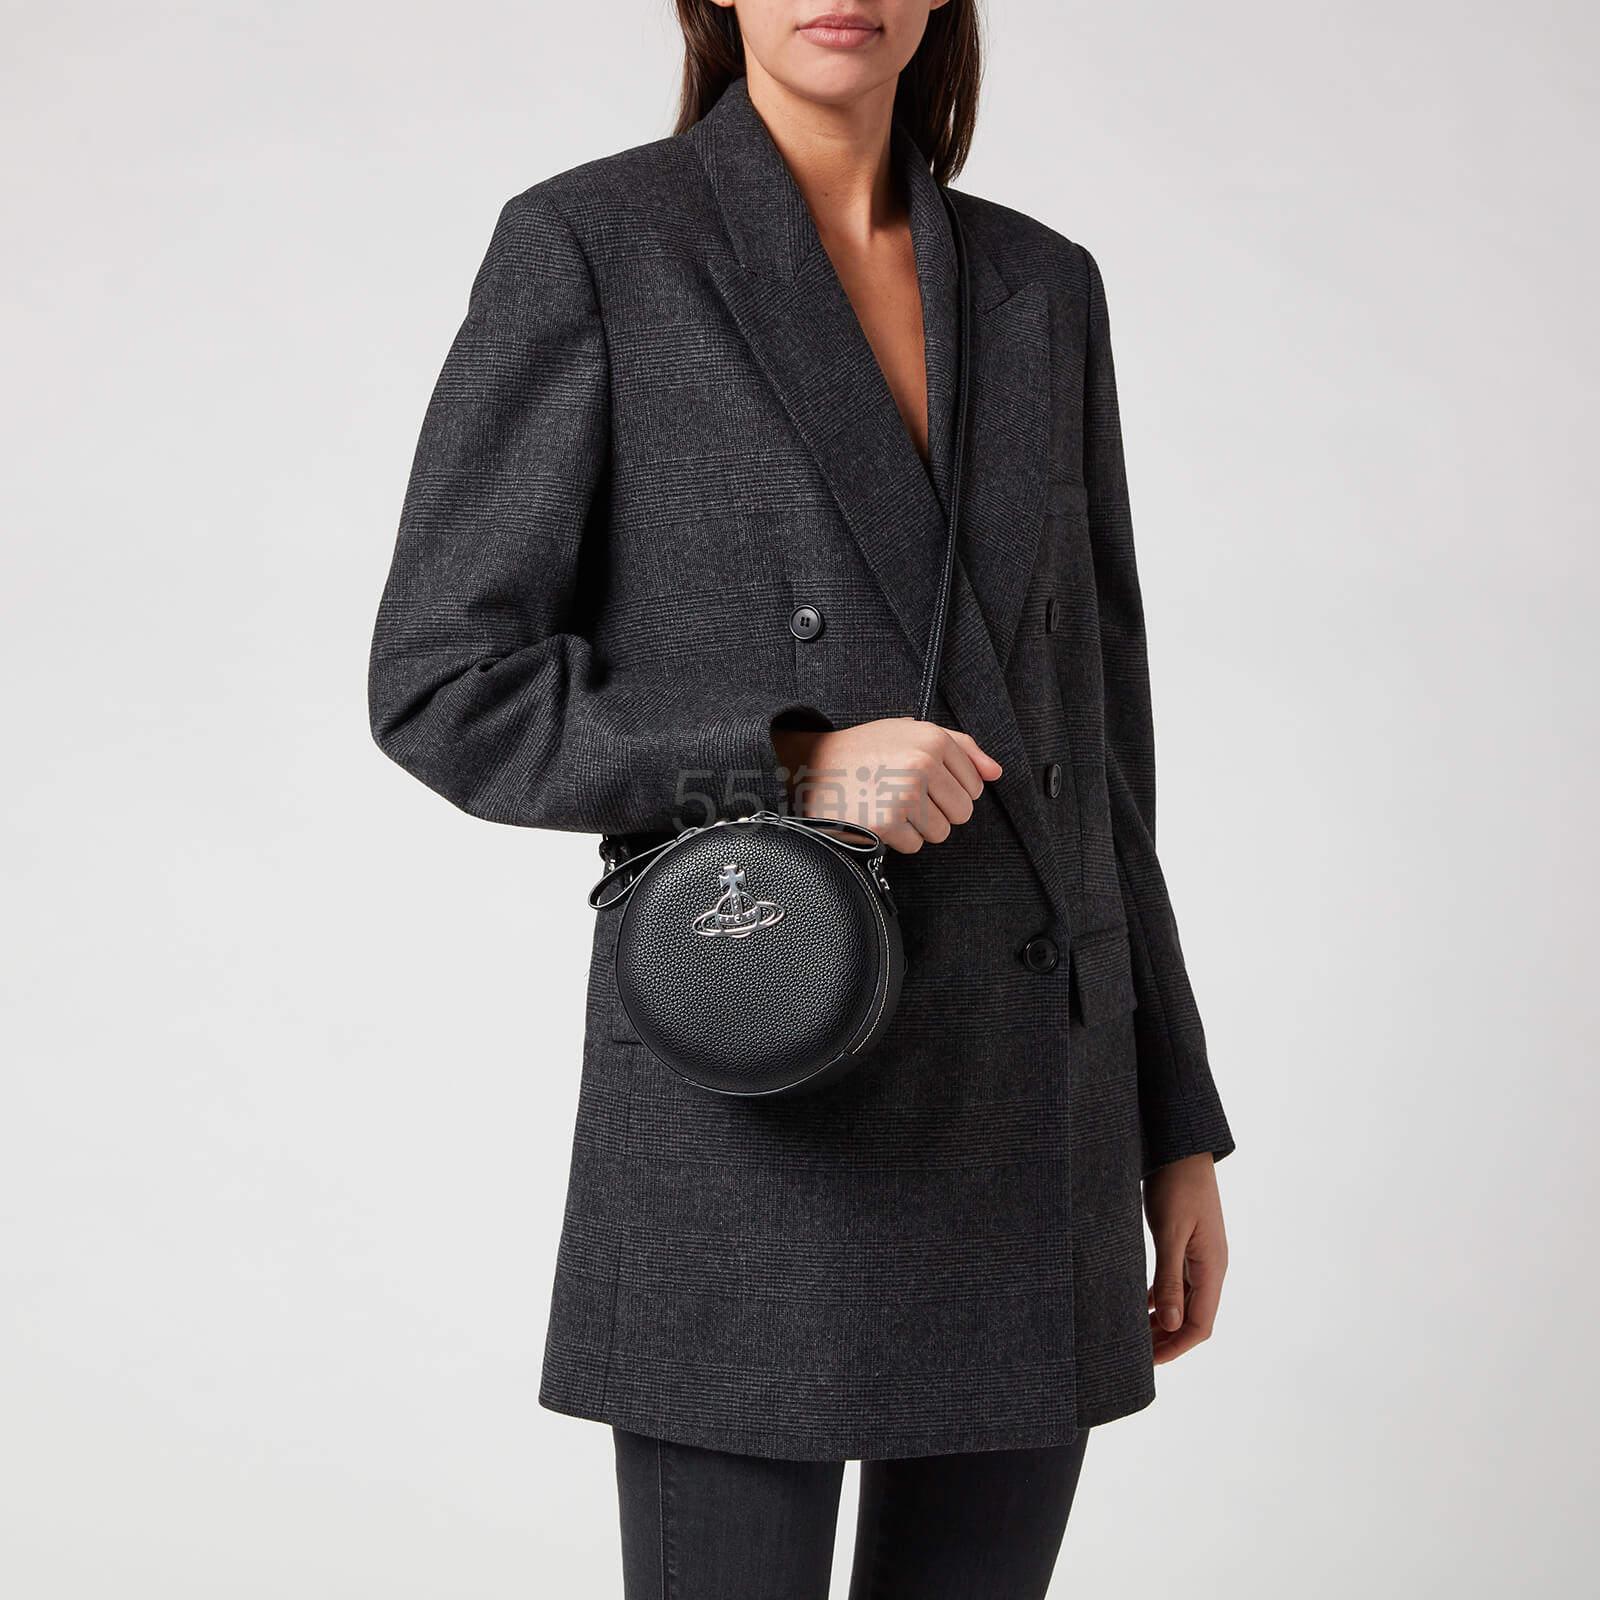 Vivienne Westwood Johanna 单肩小圆包 ¥1,386.75 - 海淘优惠海淘折扣 55海淘网